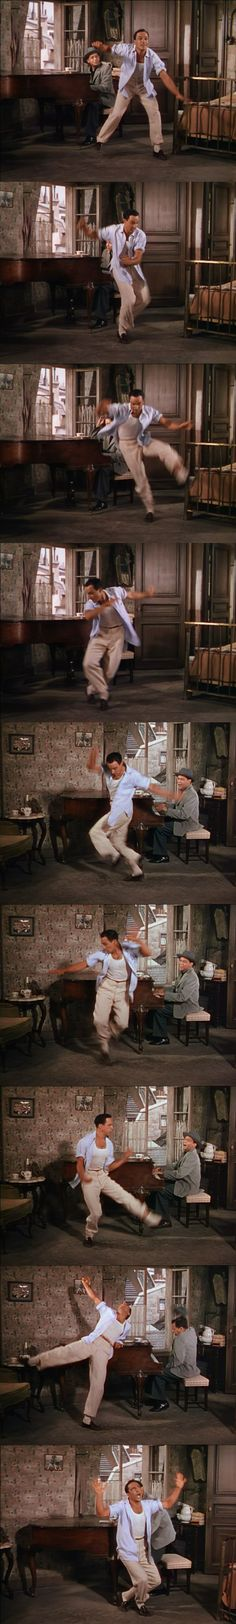 "Gene Kelly Non-stop tap dancing"" An American in Paris"" 1951"